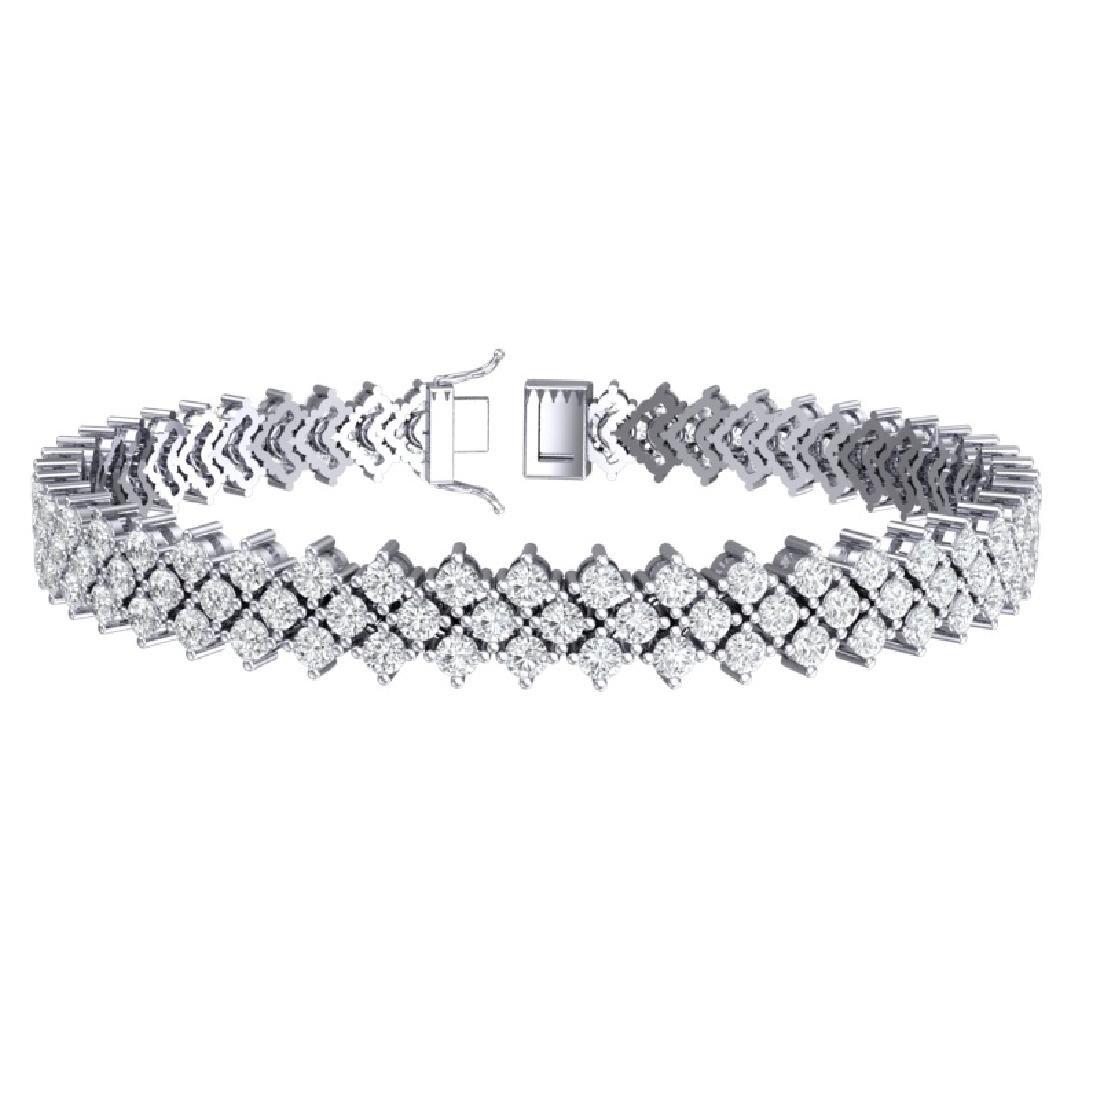 10 CTW Certified SI/I Diamond Bracelet 18K White Gold - 3